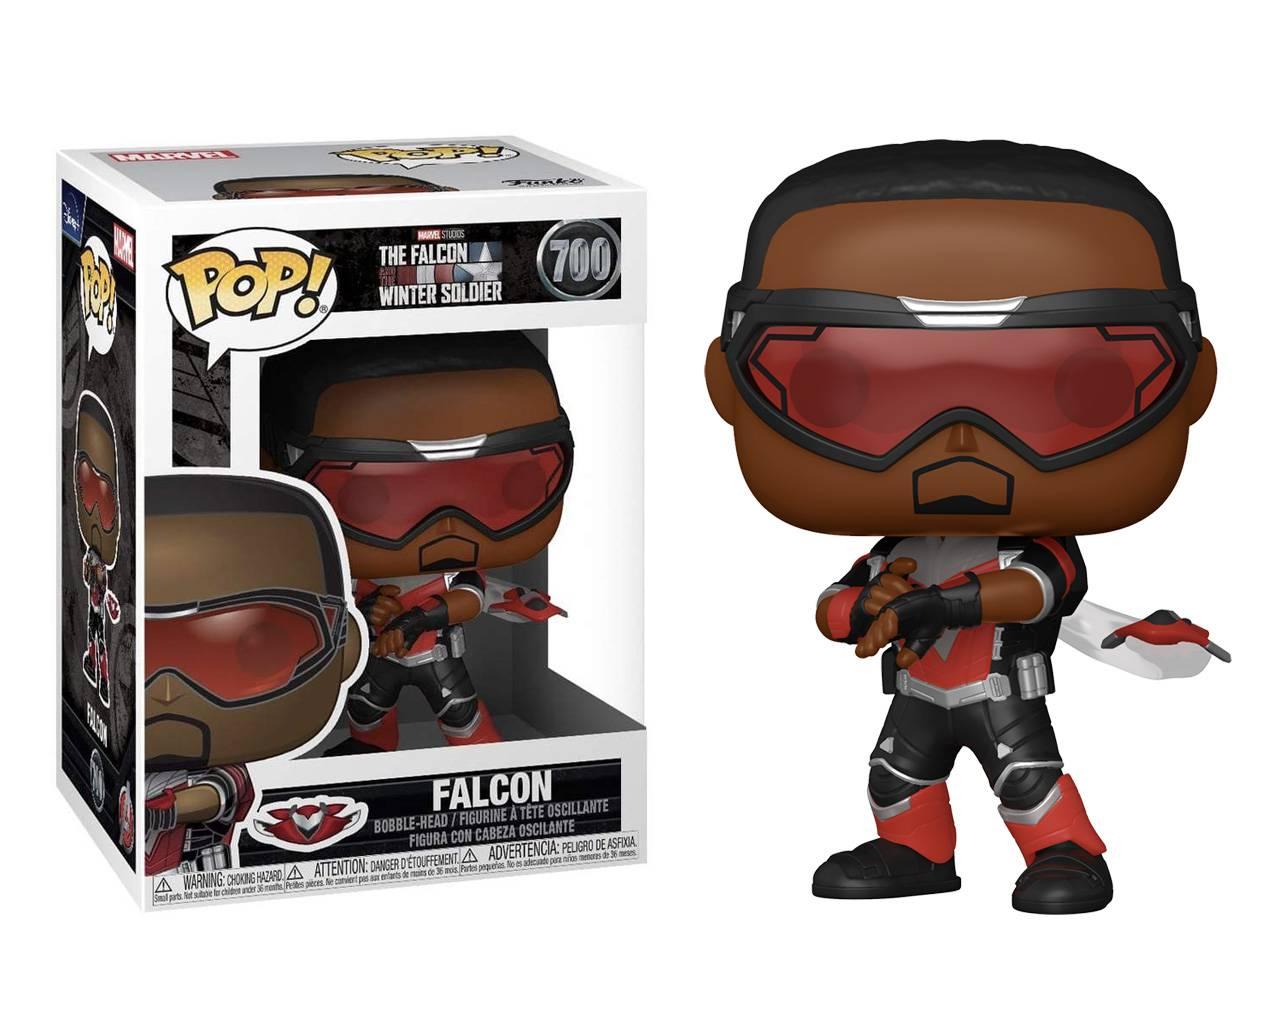 Falcon Pop! Vinyl